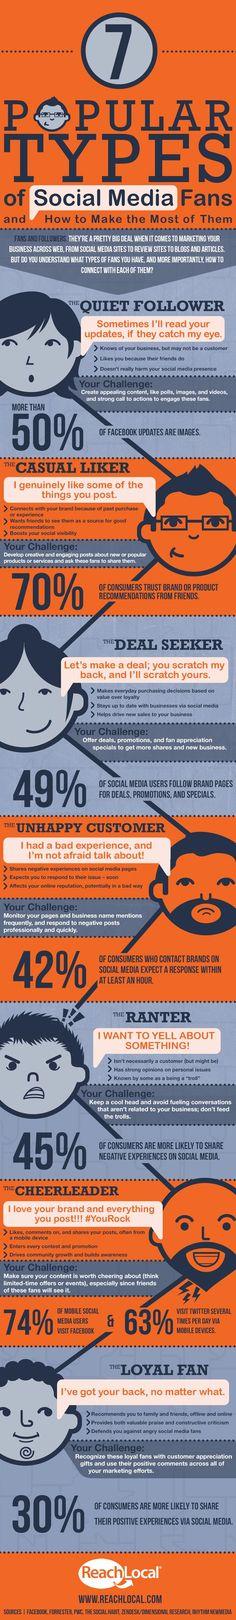 7 Popular Types of #SocialMedia Fans, #inbound [Infographic].